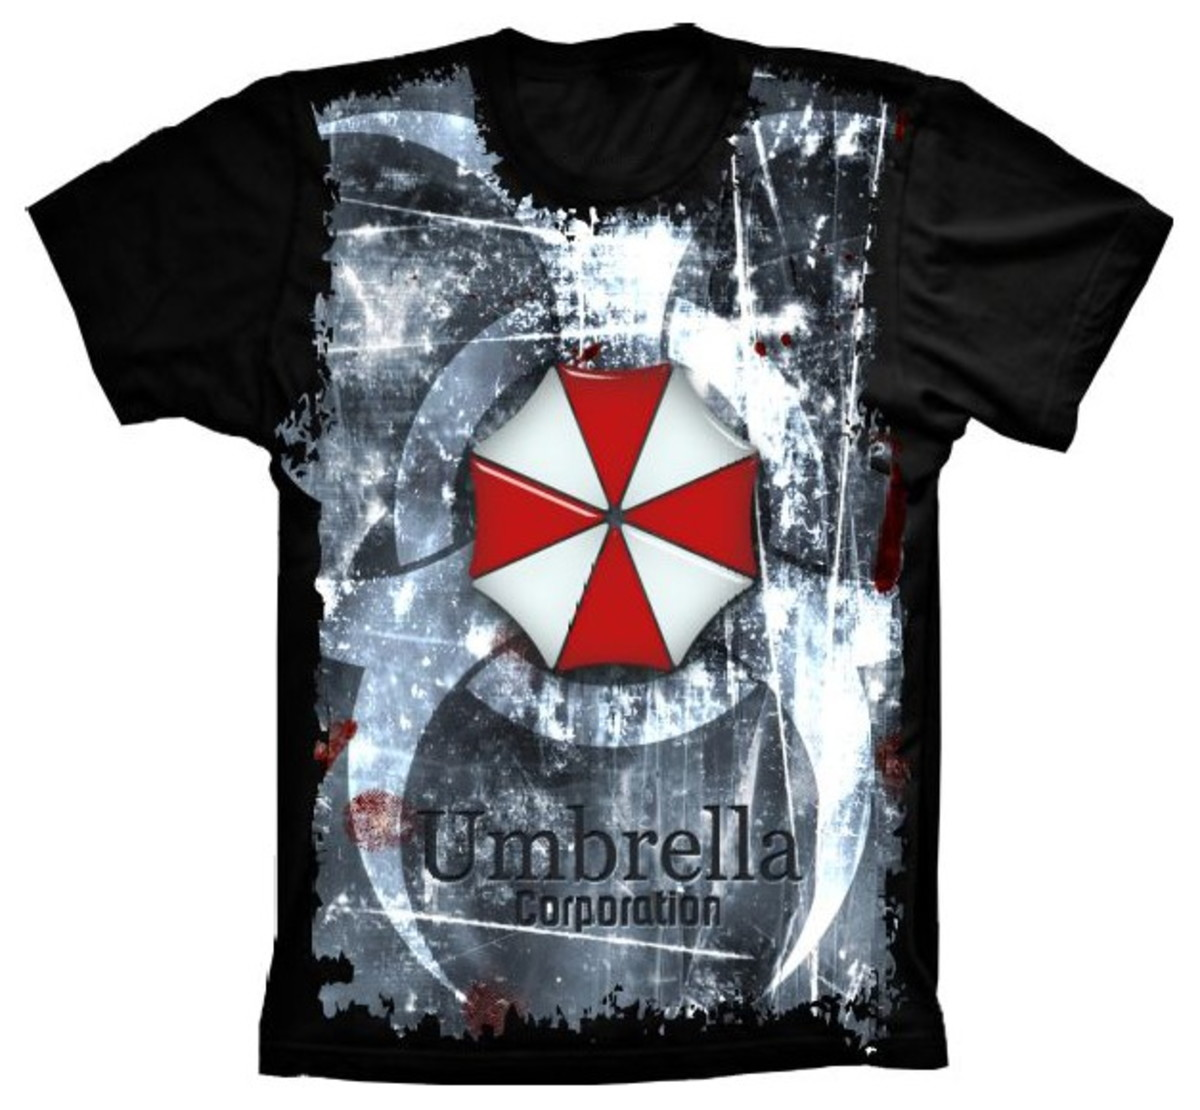 7ecafd492 Camiseta Resident Evil Umbrella Corporation no Elo7